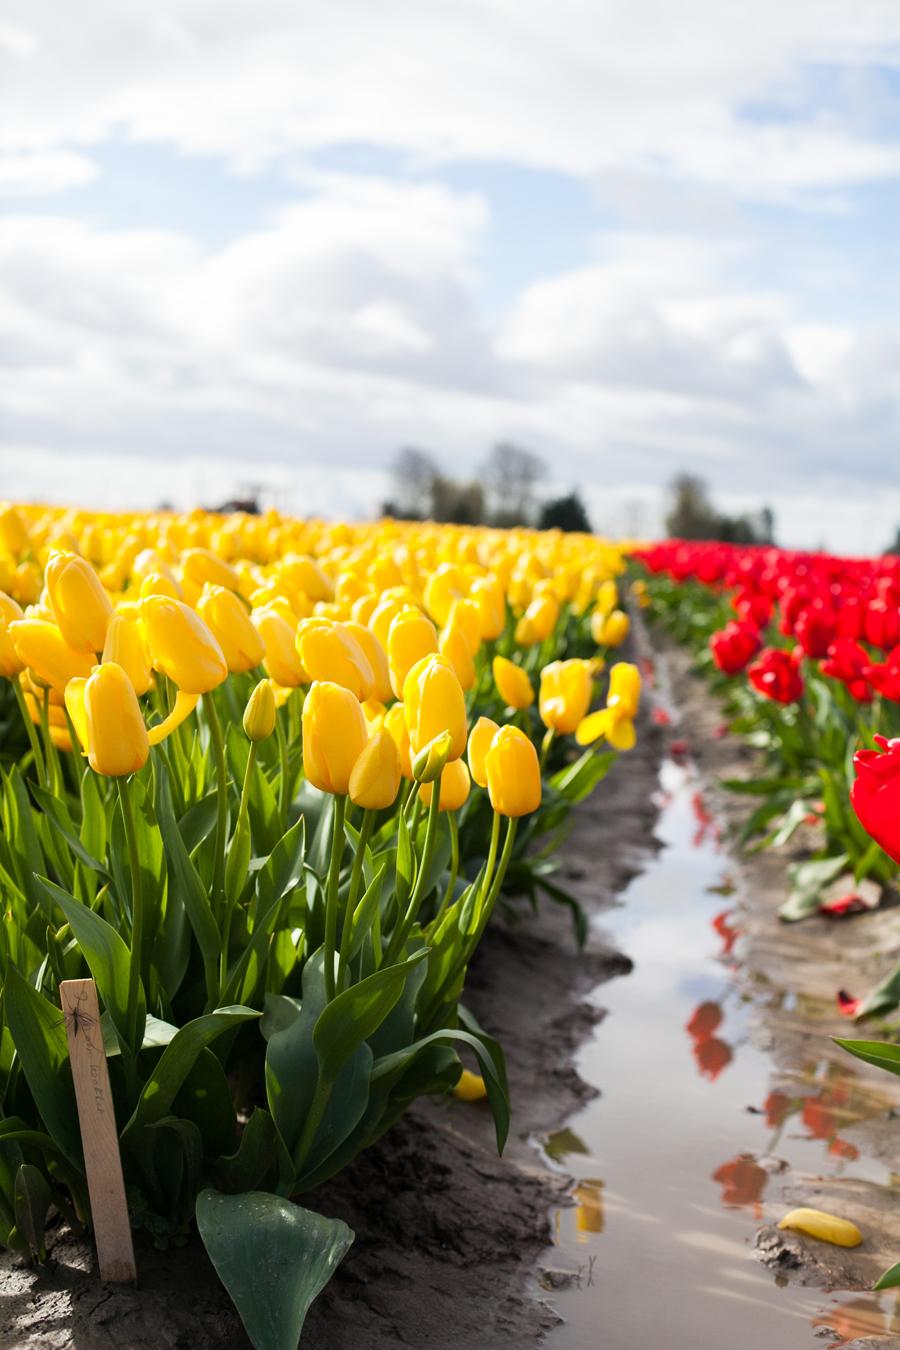 005-mount-vernon-washington-tulip-festival-2015.jpg